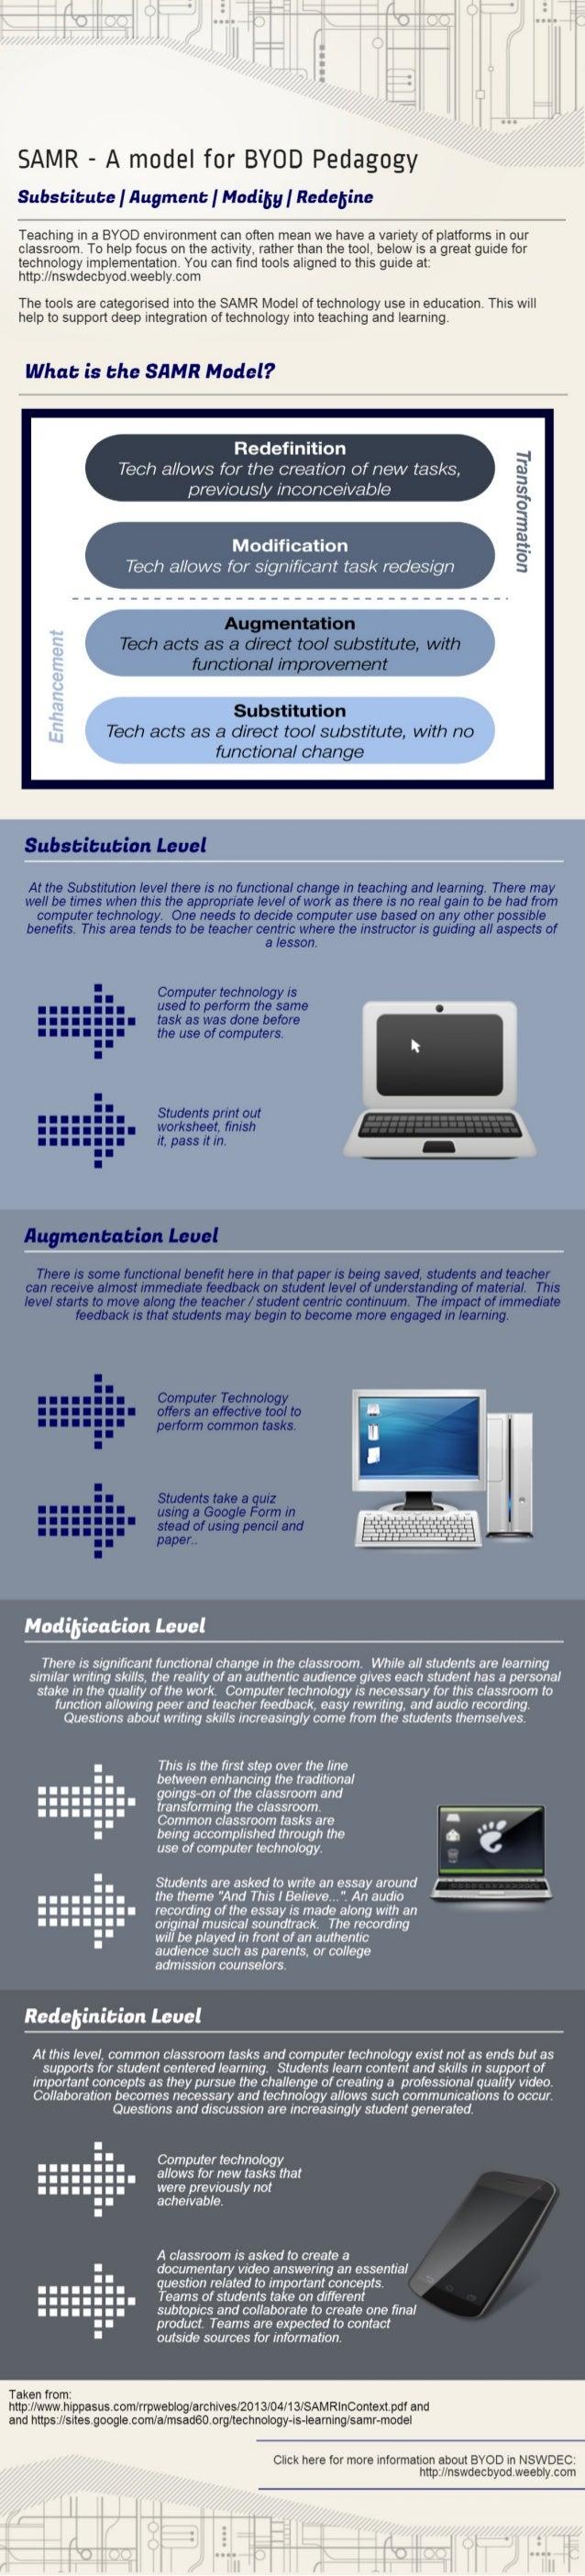 SAMR Model of Technology Integration